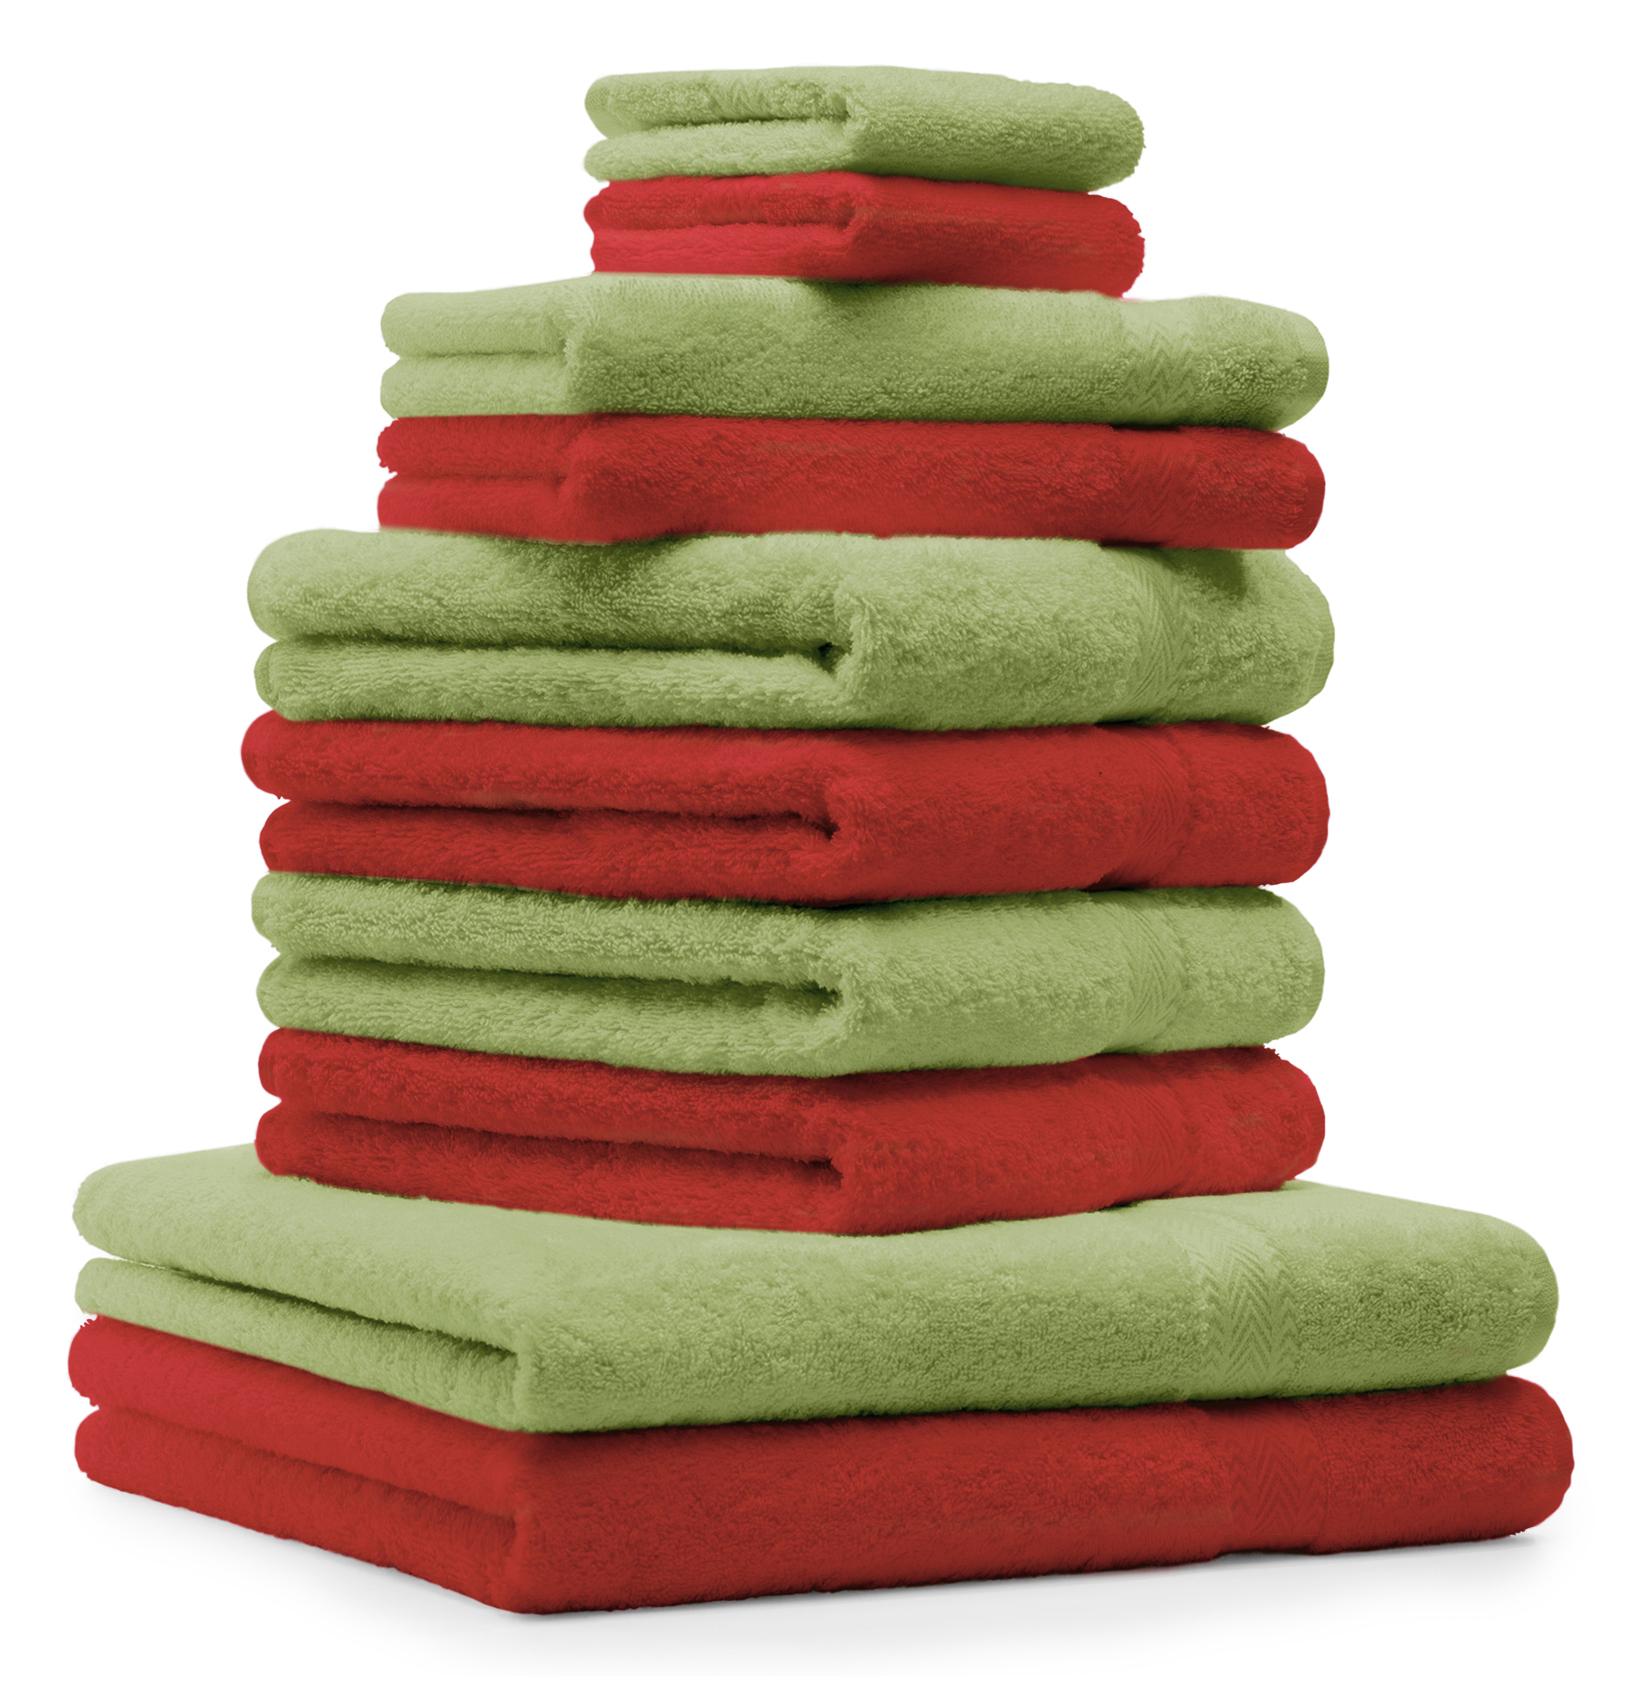 betz 10 tlg handtuch set classic 100 baumwolle 2 duscht cher 4 handt cher 2 g stet cher 2. Black Bedroom Furniture Sets. Home Design Ideas